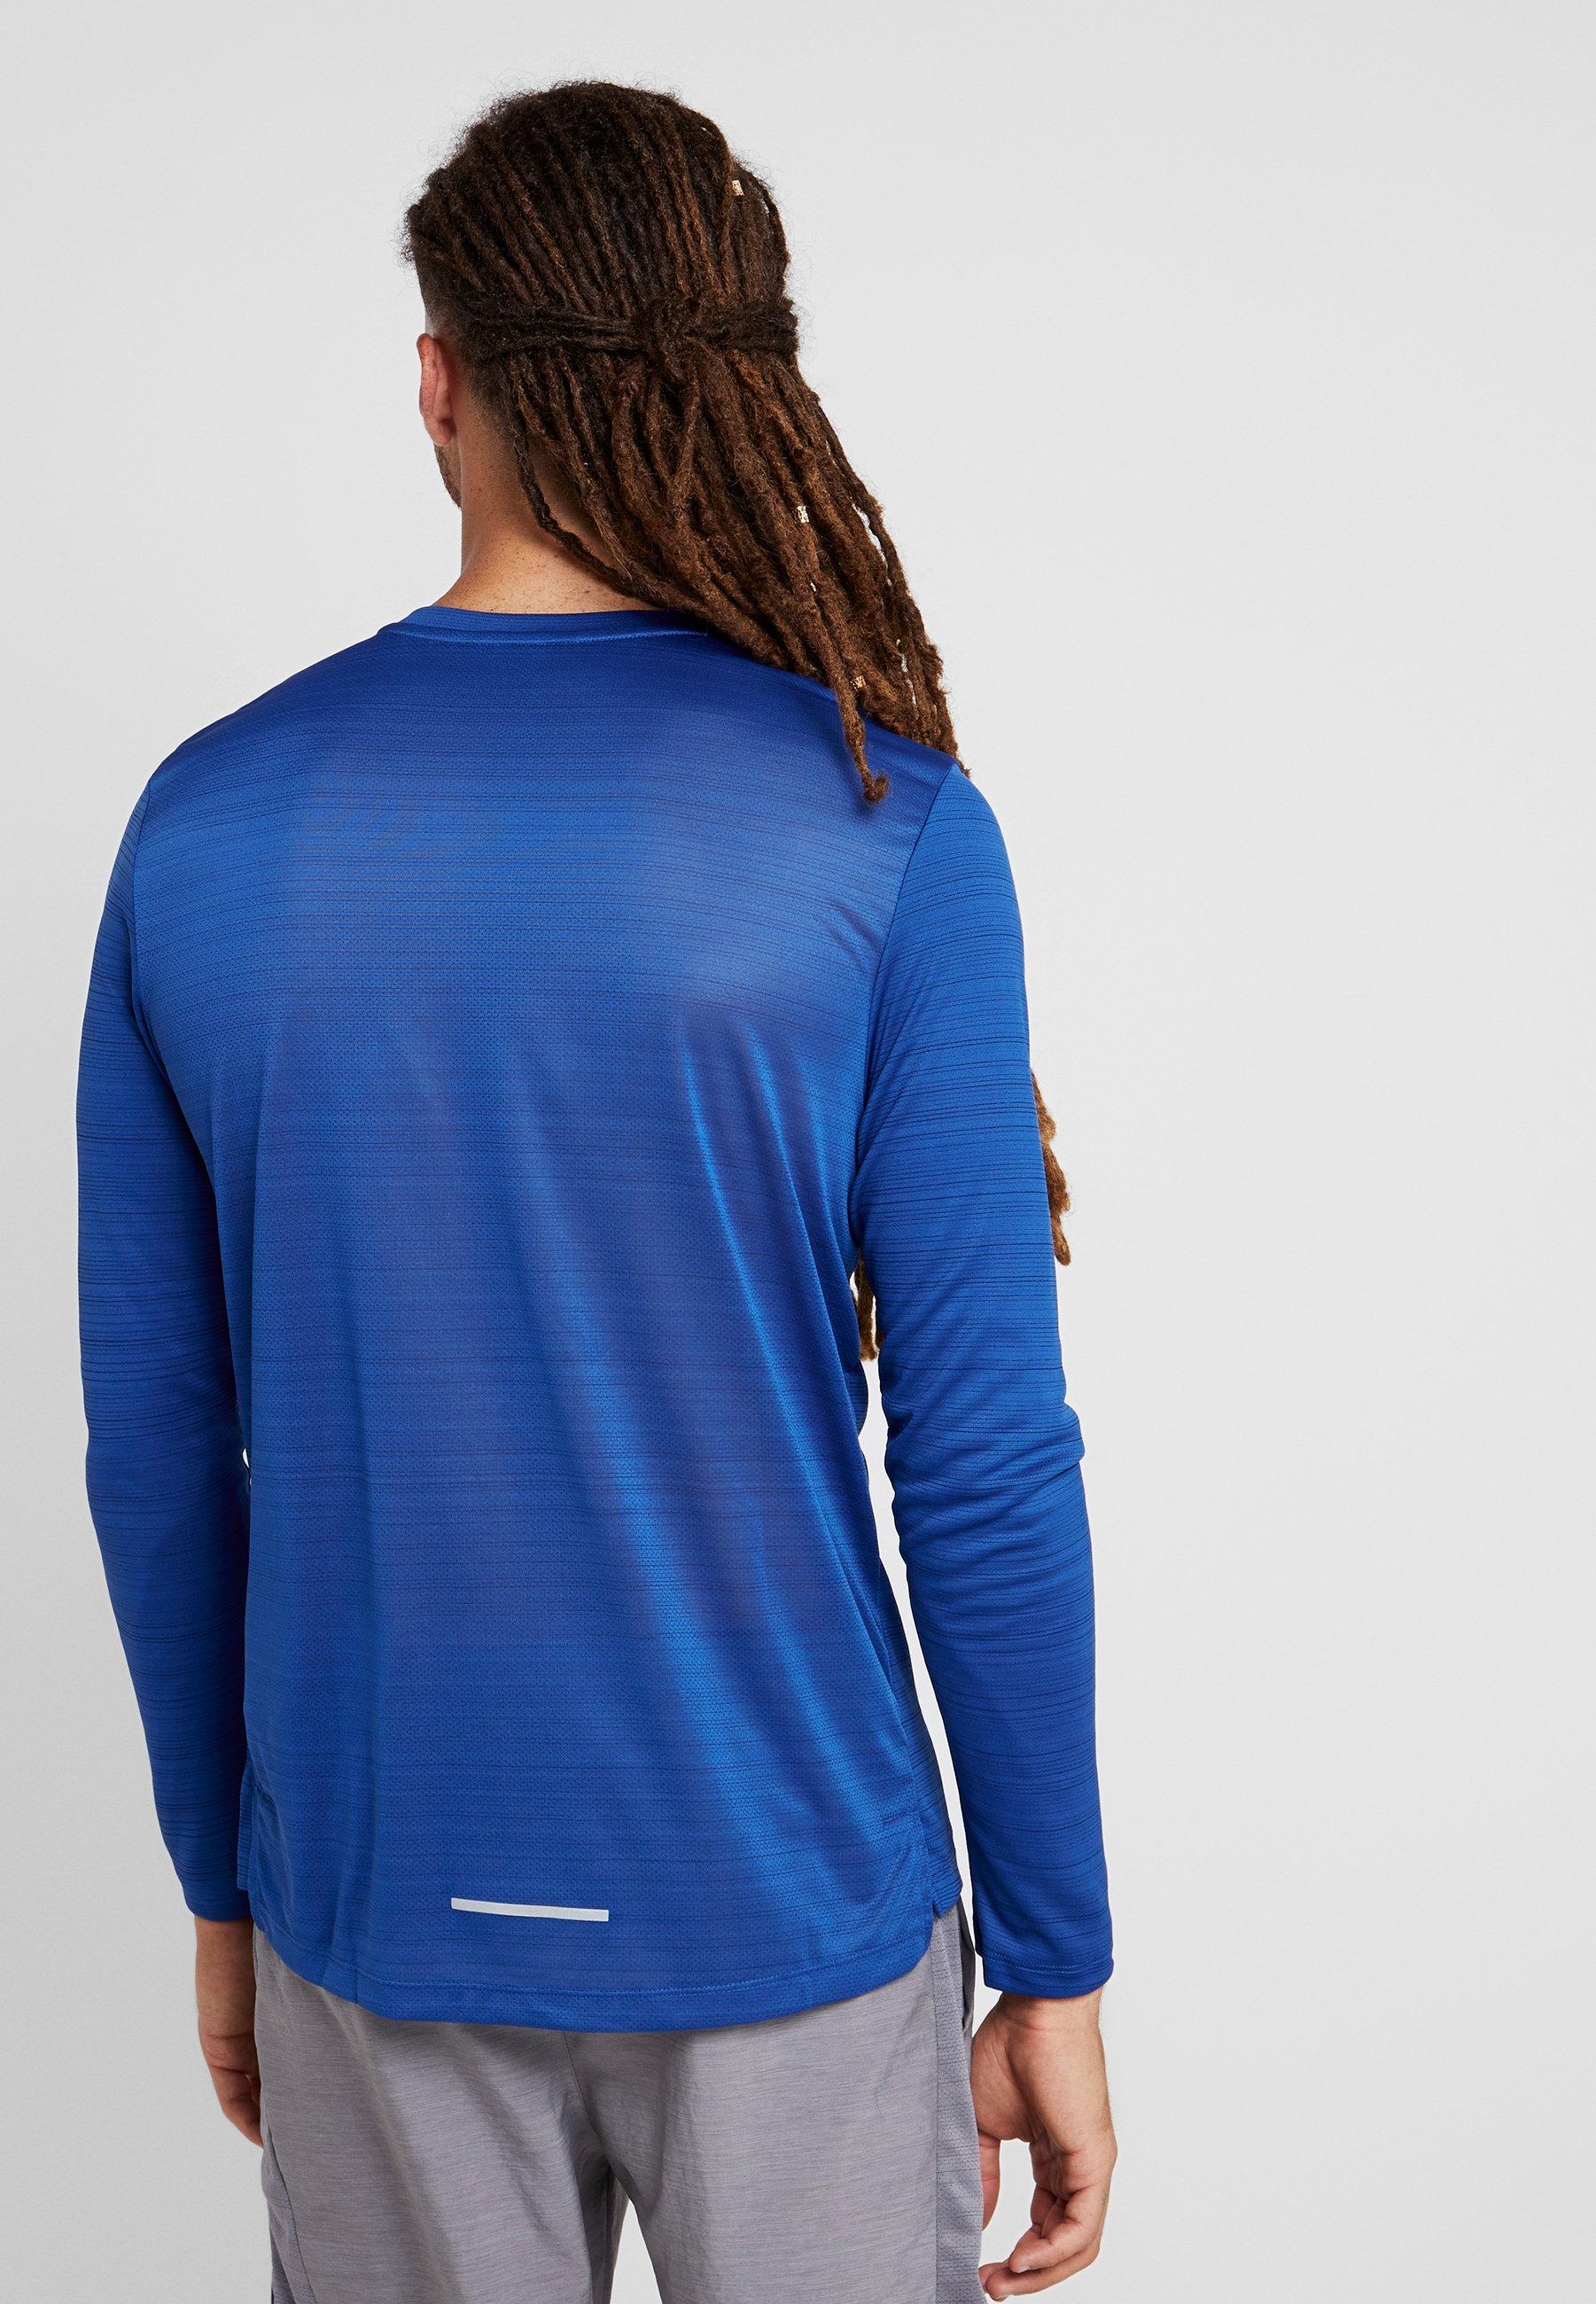 Silver De Void blue Nike Dry reflective Sport Performance MilerT shirt Indigo Force xoerWBdC